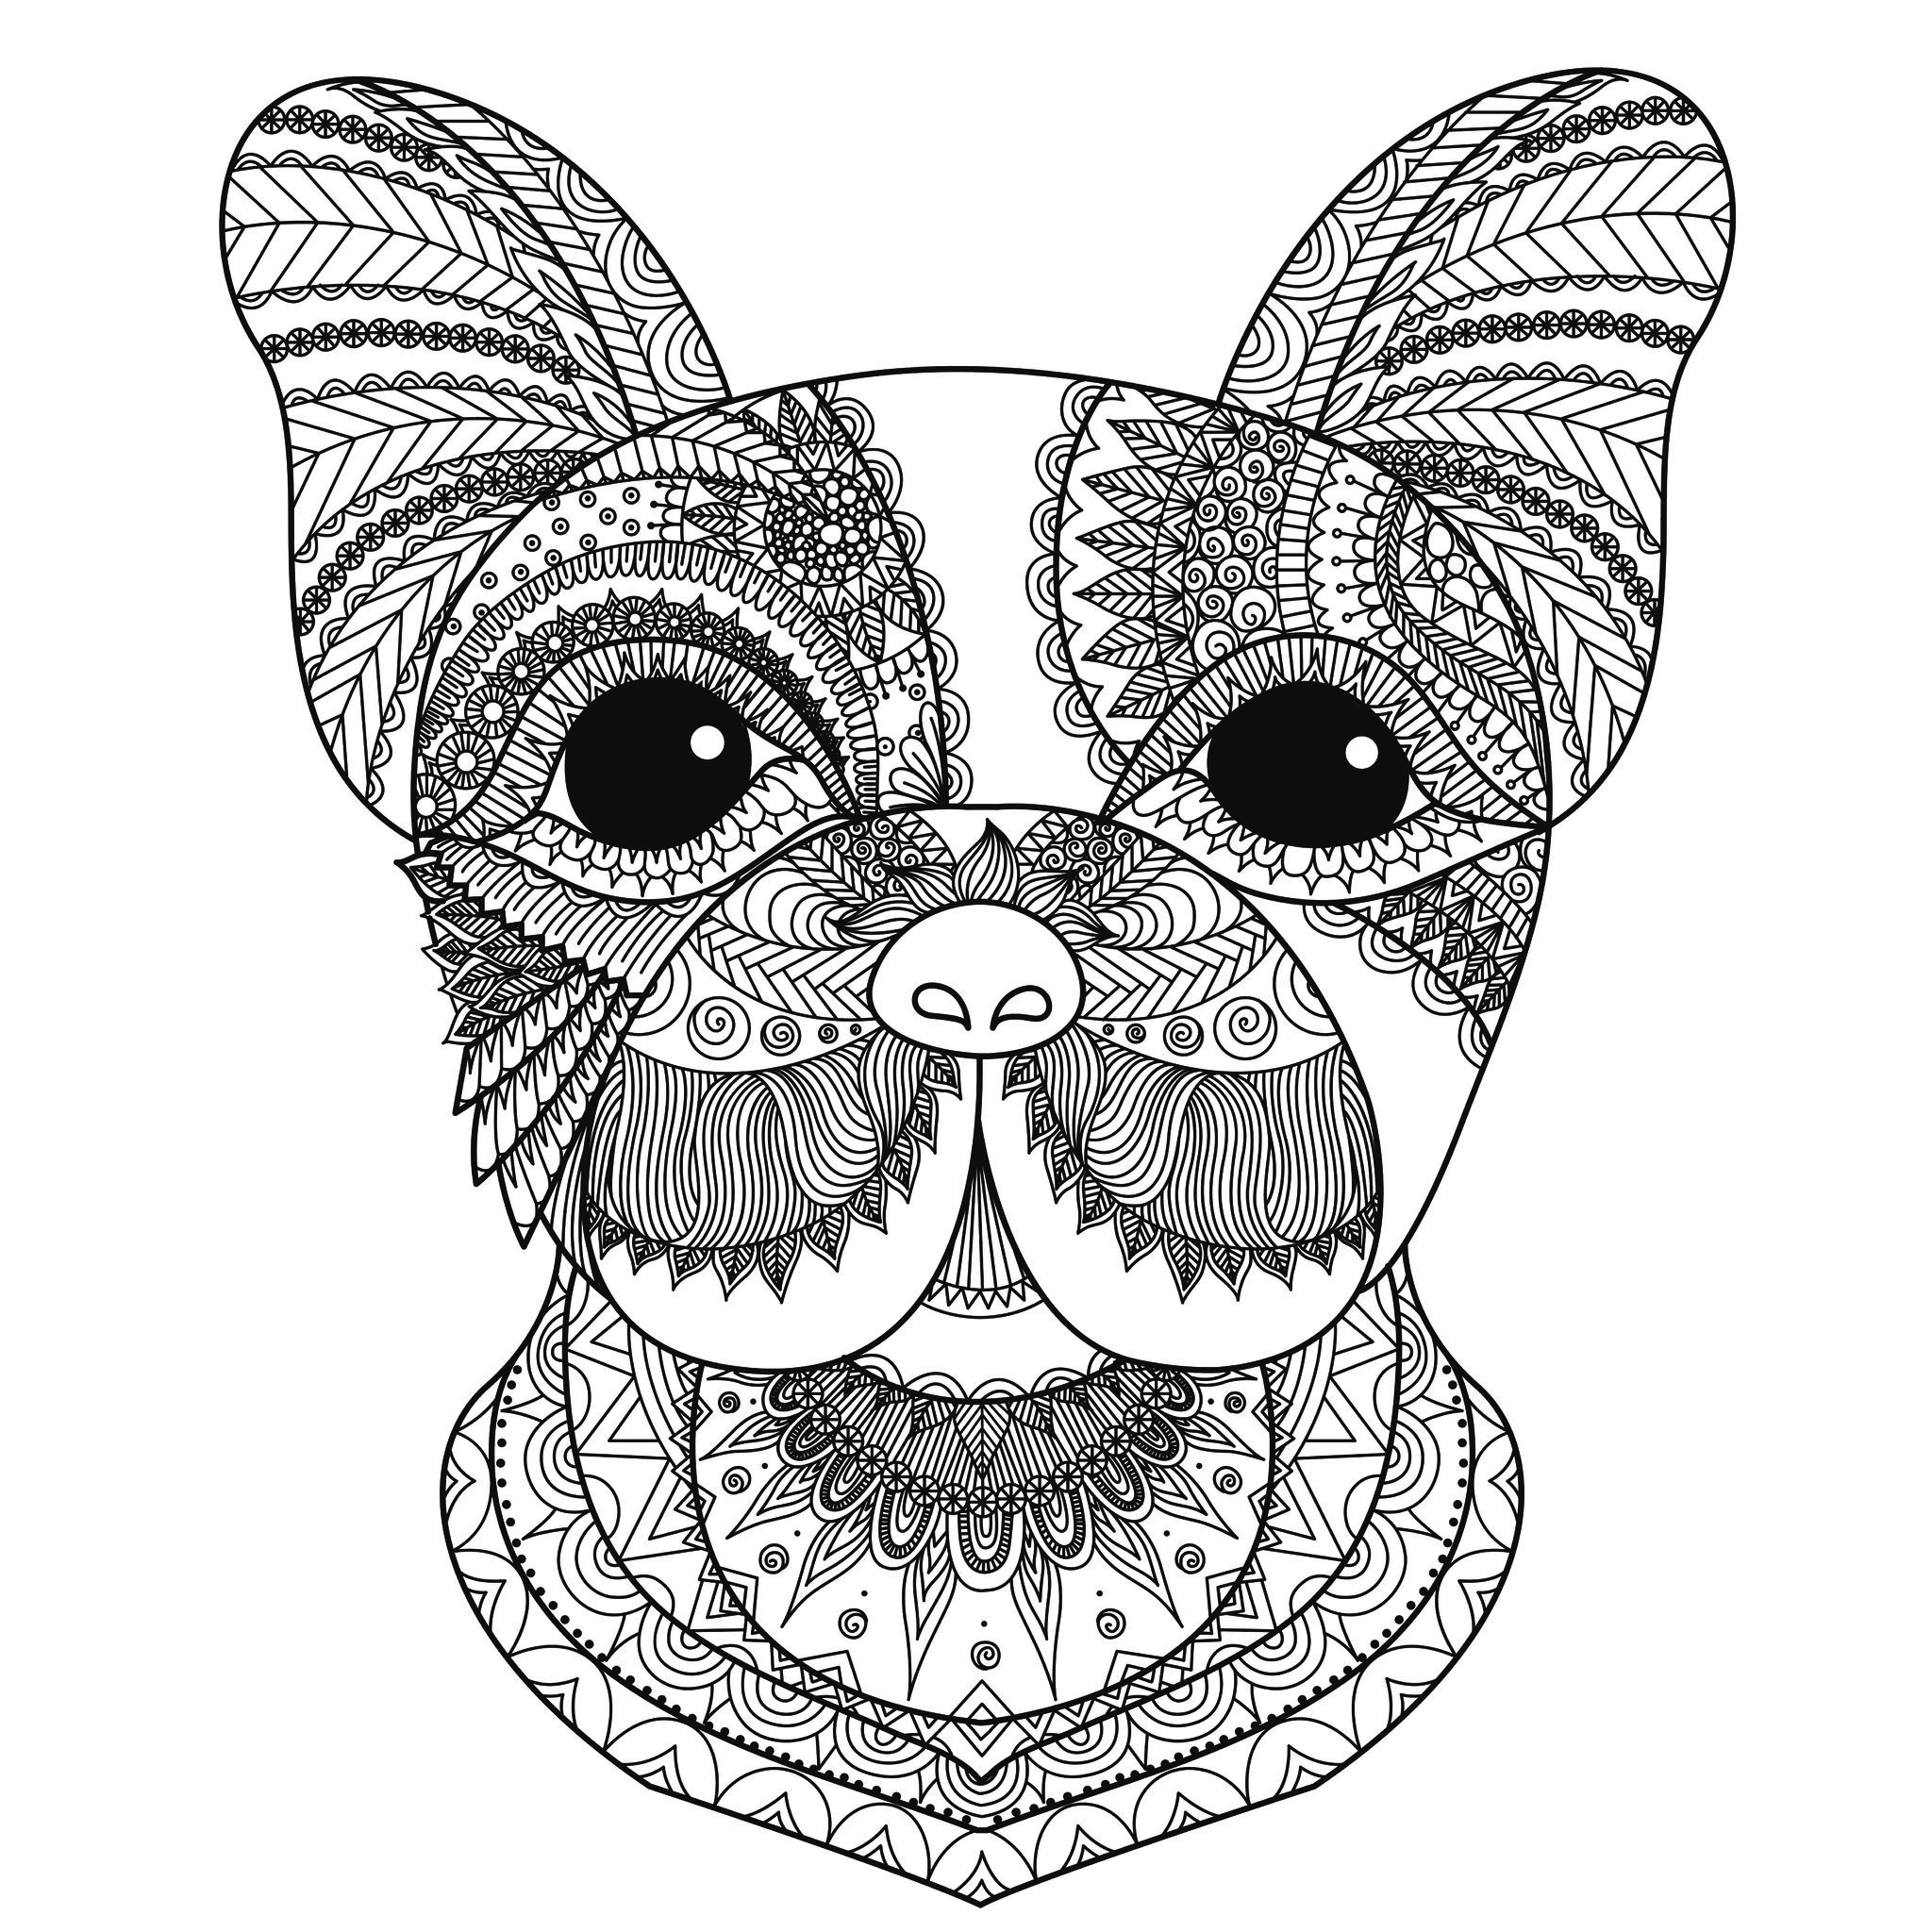 Tete de chien bimdeedeeA partir de la galerie : Calendrier De Lavent 2016